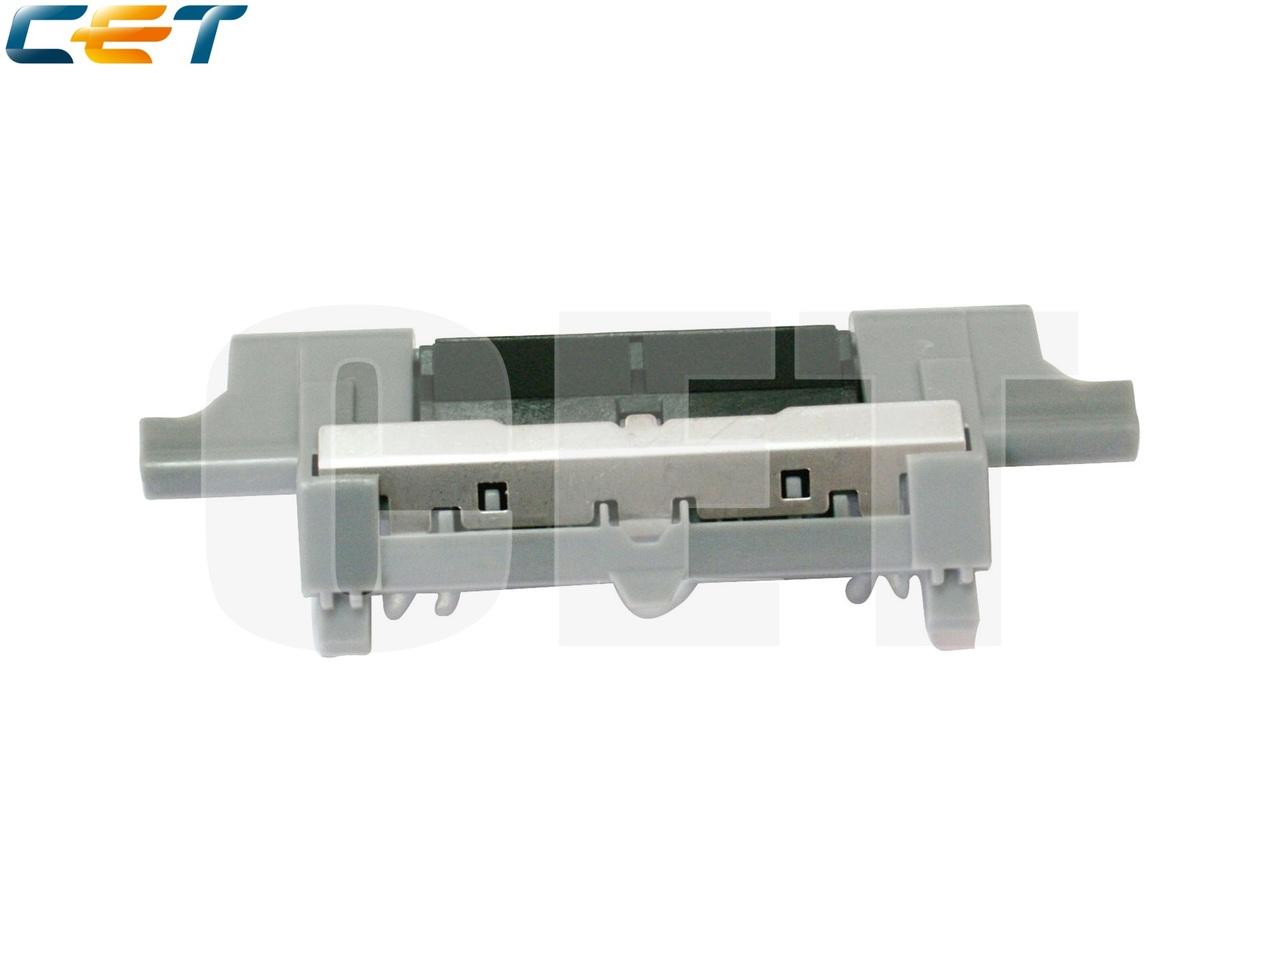 Тормозная площадка 2-го лотка RM1-6397-000 для HP LaserJetP2035/P2055, M401/M425 (CET), CET3691